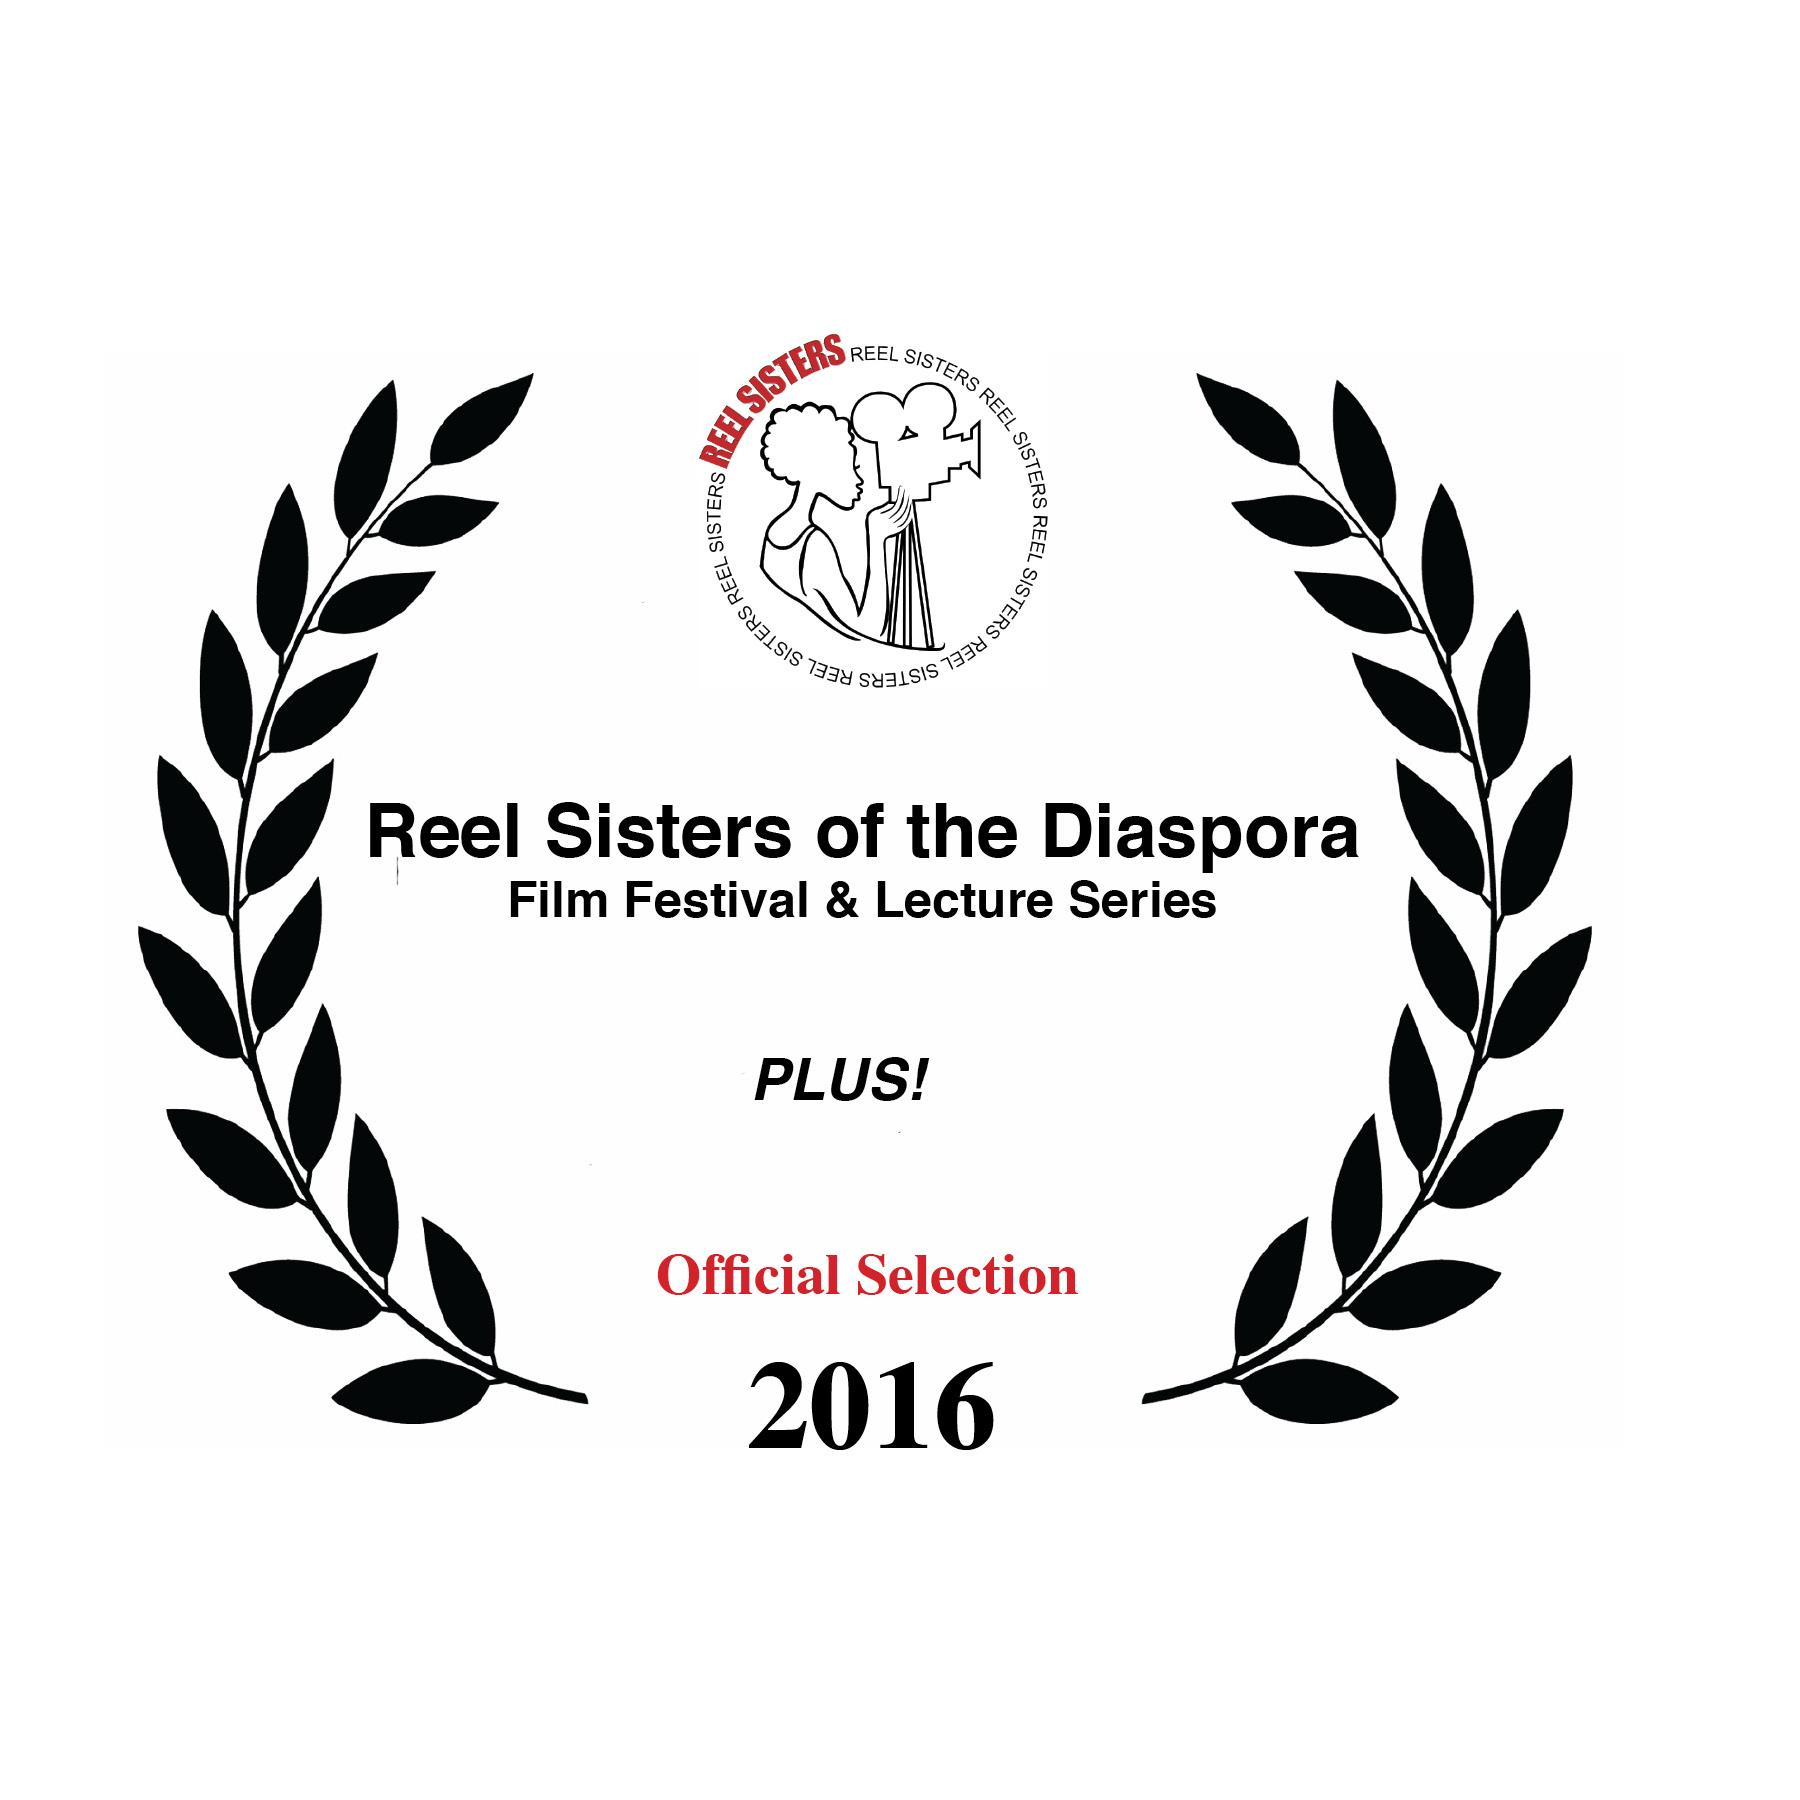 Reel Sisters of the Diaspora Film Festival 2016.jpg